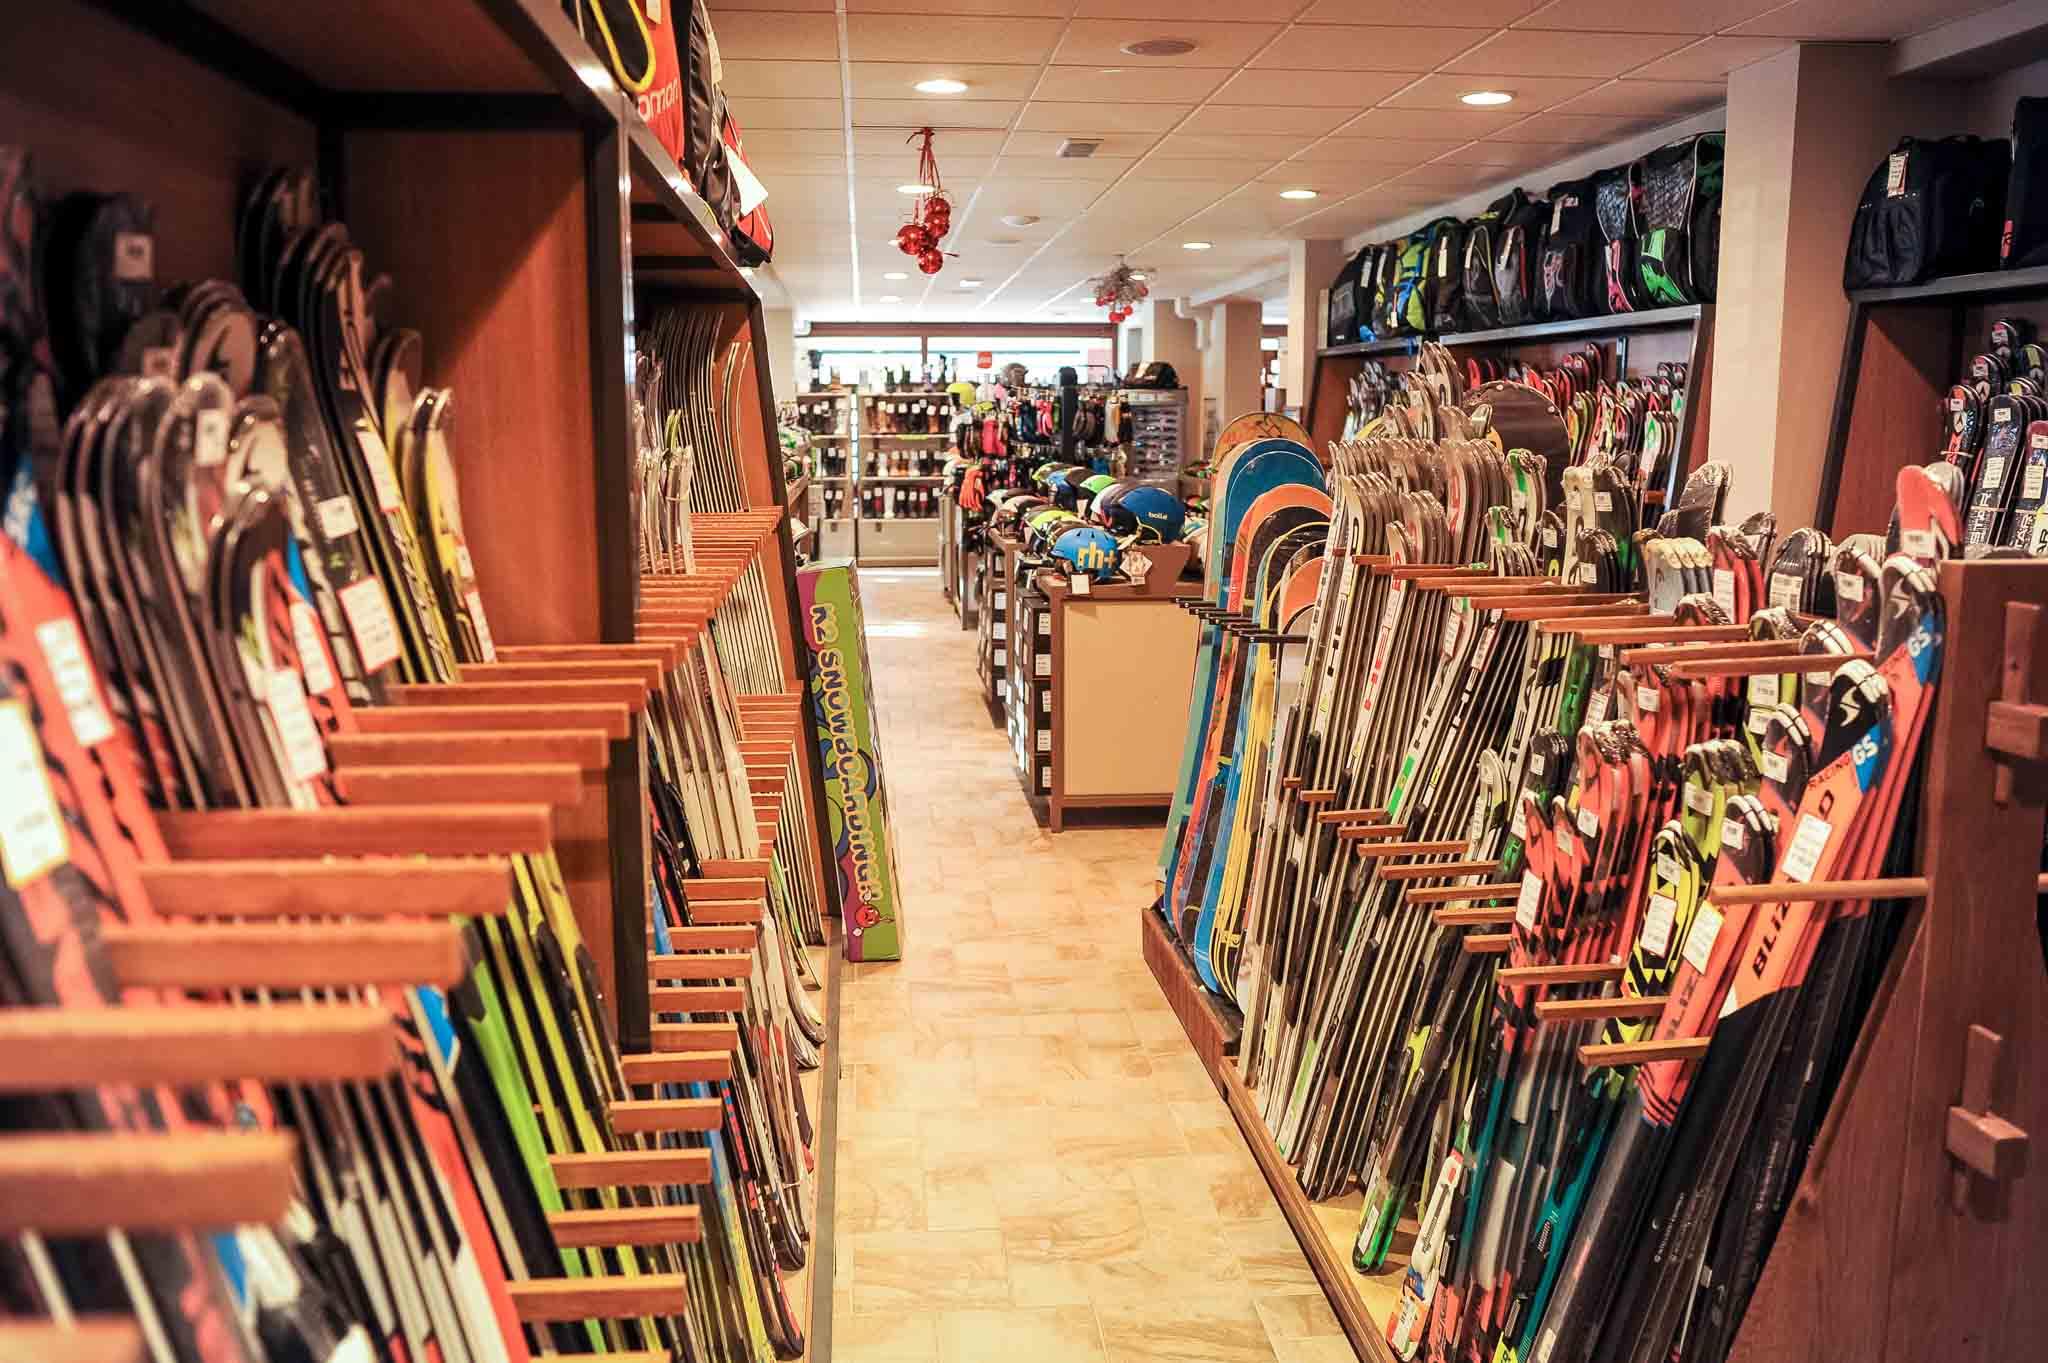 Noleggio sci Prato Nevoso